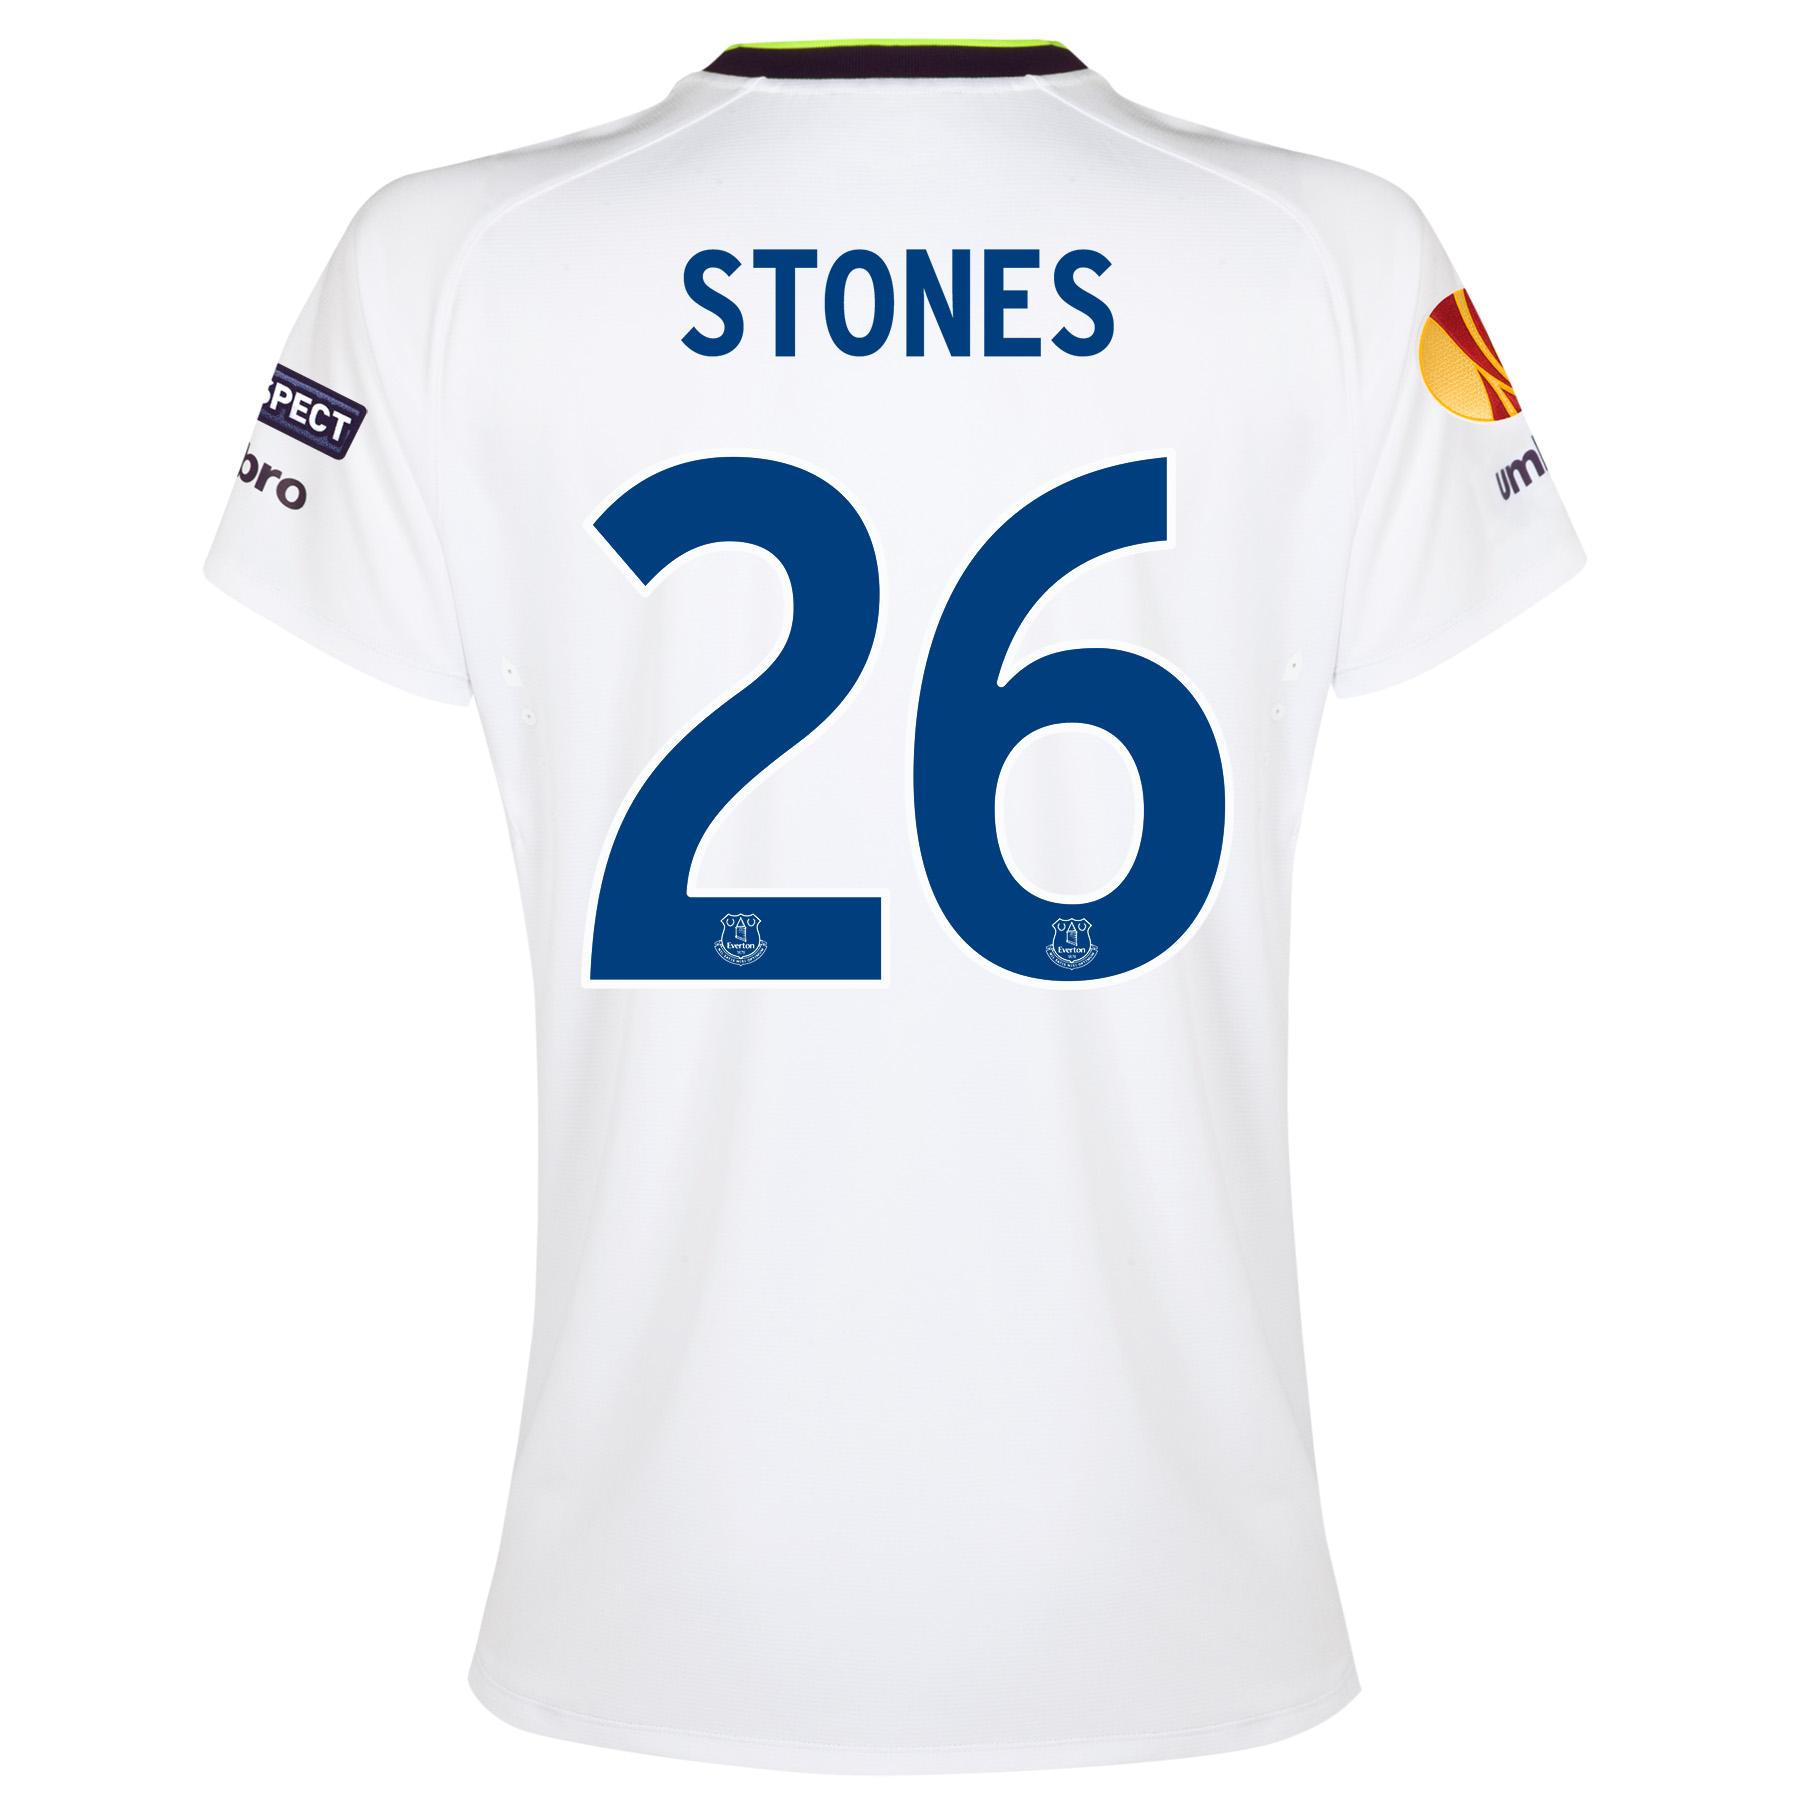 Everton UEFA Europa League 3rd Shirt 2014/15 - Womens with Stones 26 p